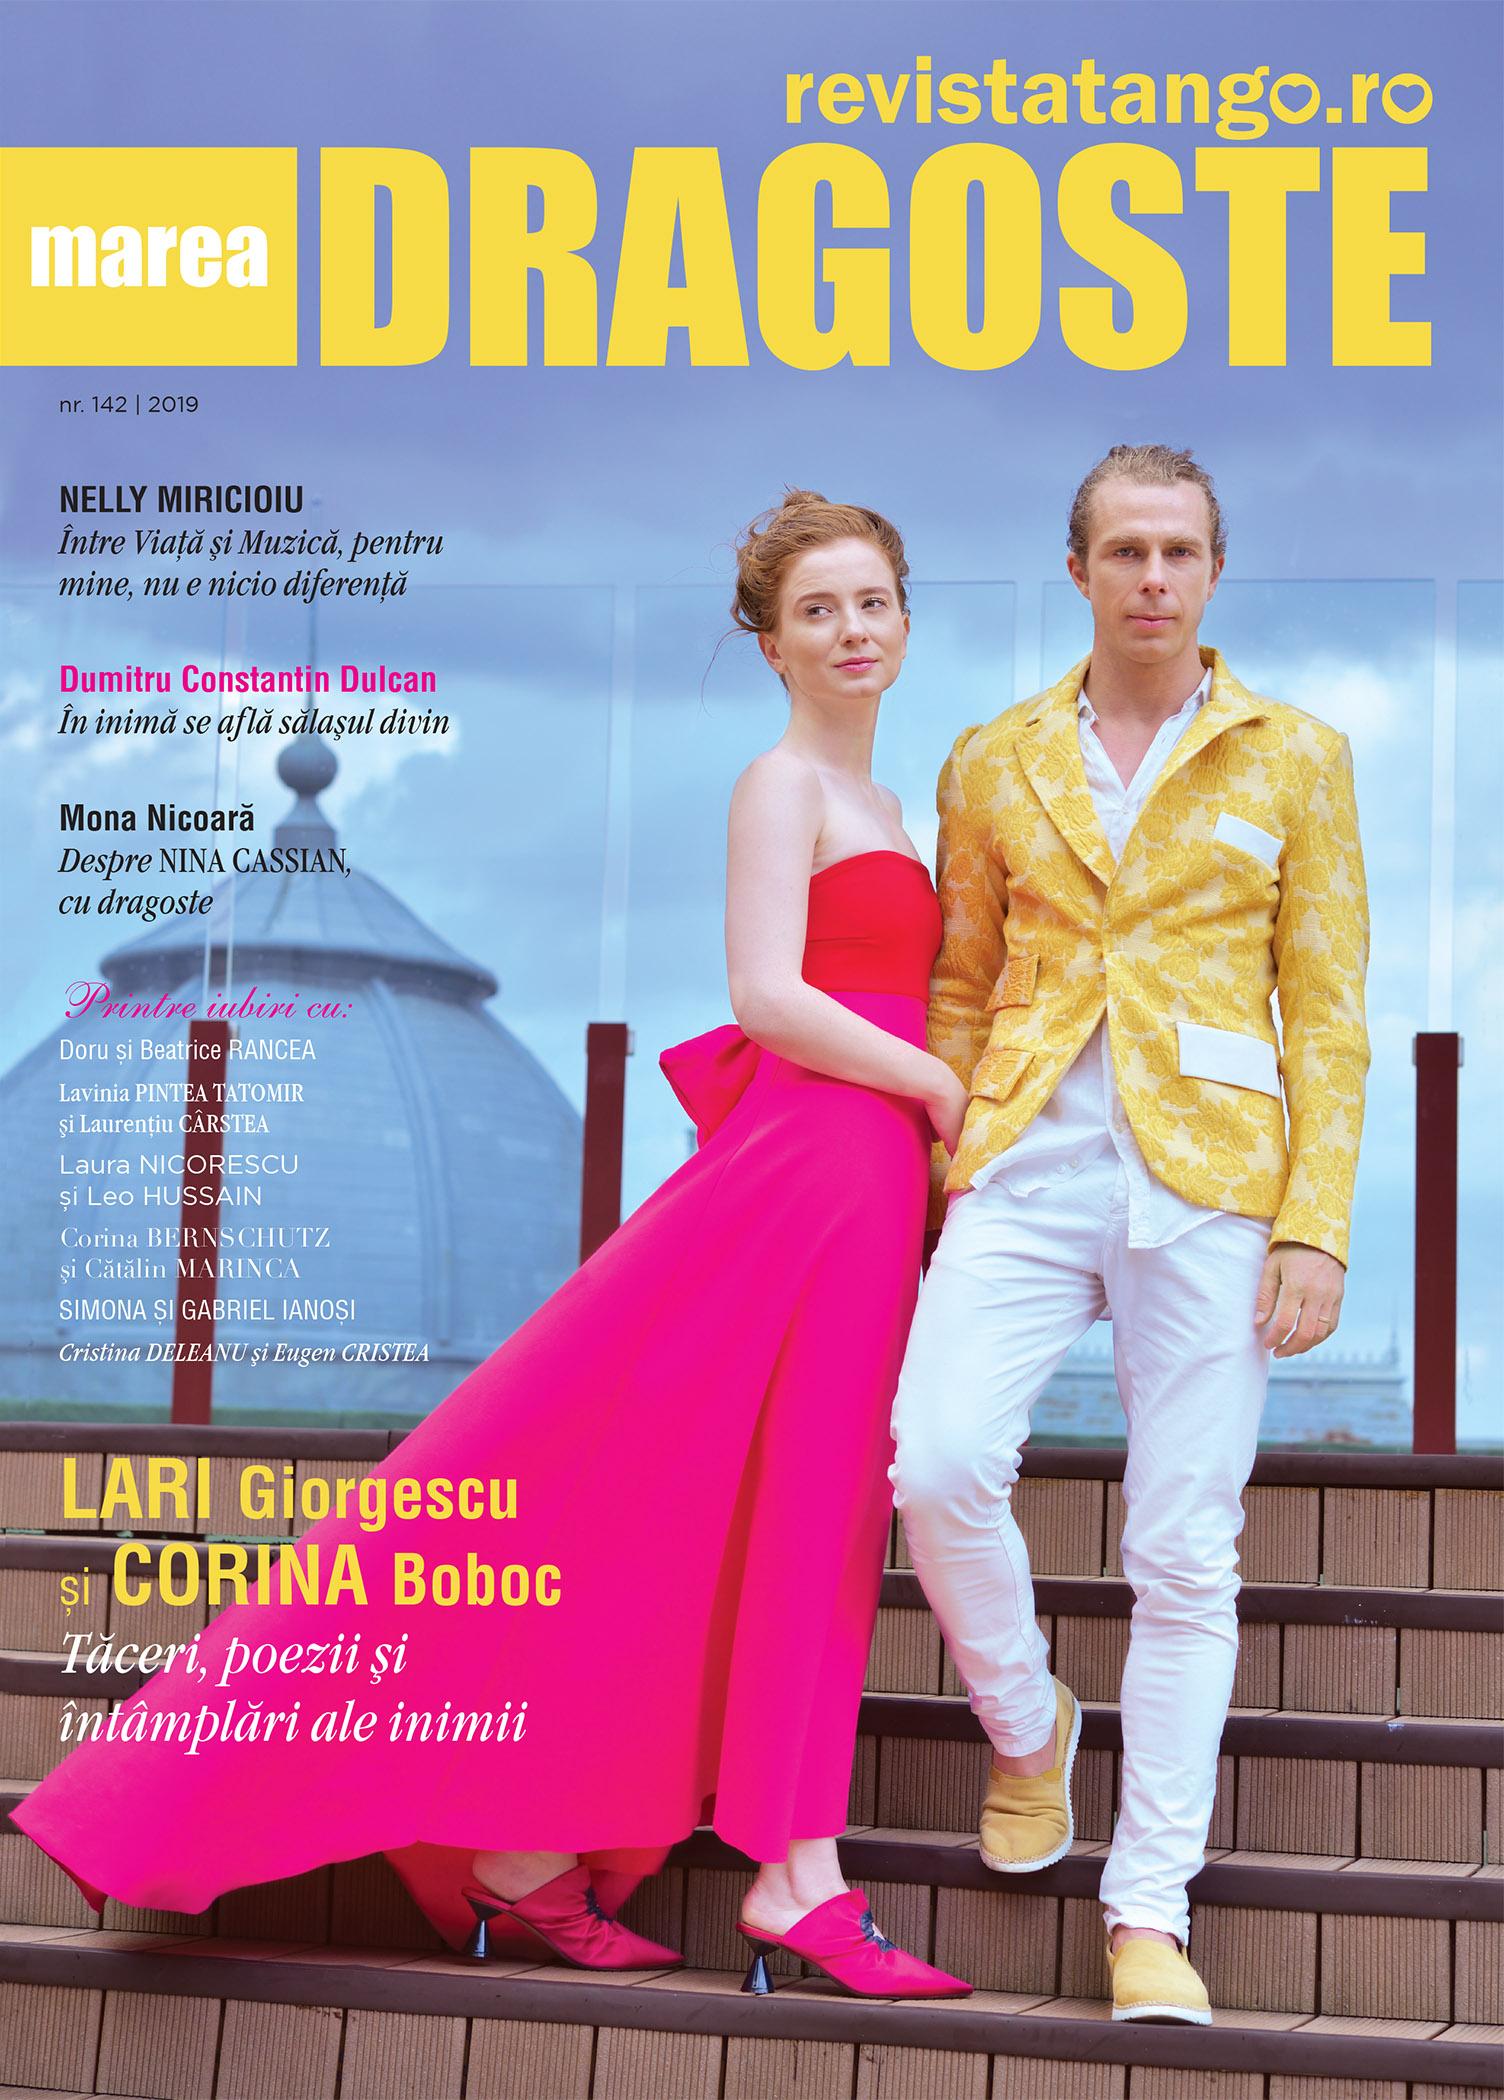 Lari Giorgescu si Corina Boboc pe coperta Marea Dragoste-revistatango.ro, nr. 142, 2019